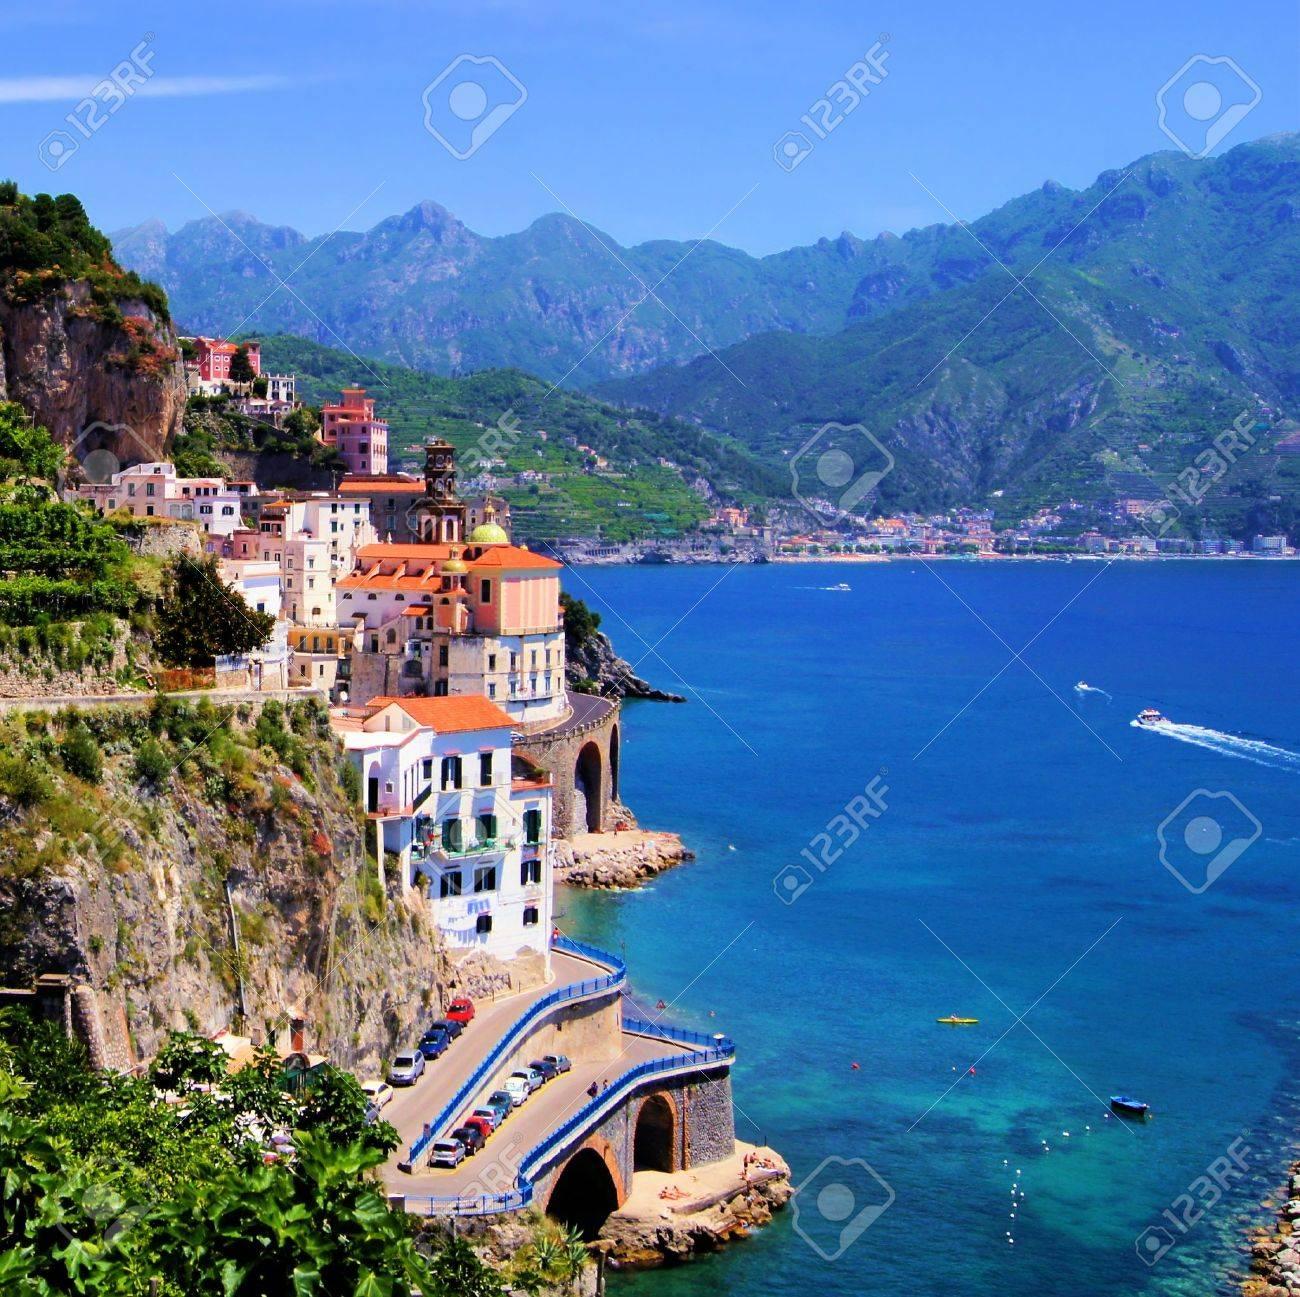 View of the village of Atrani, Amalfi Coast, Italy - 18802365